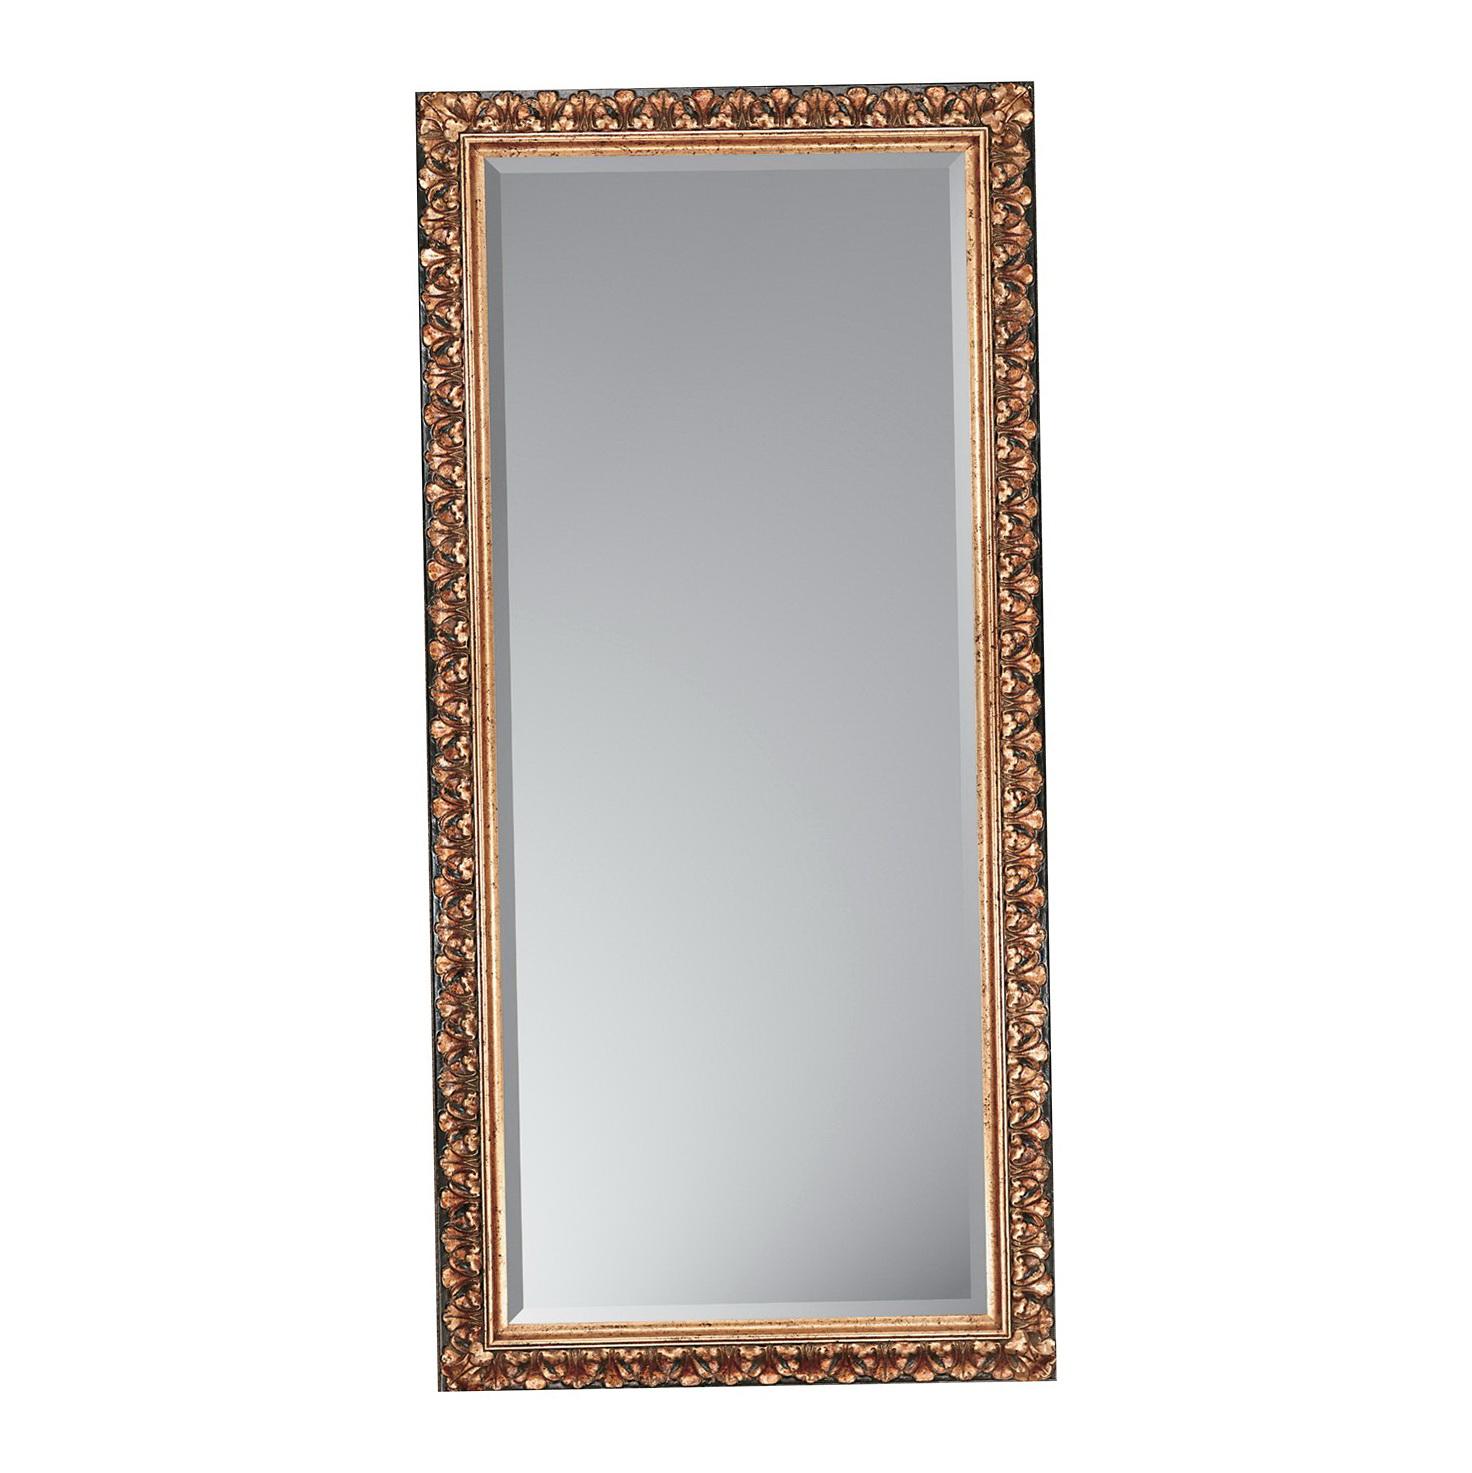 Antique gold floor mirror home design ideas for Gold floor standing mirror